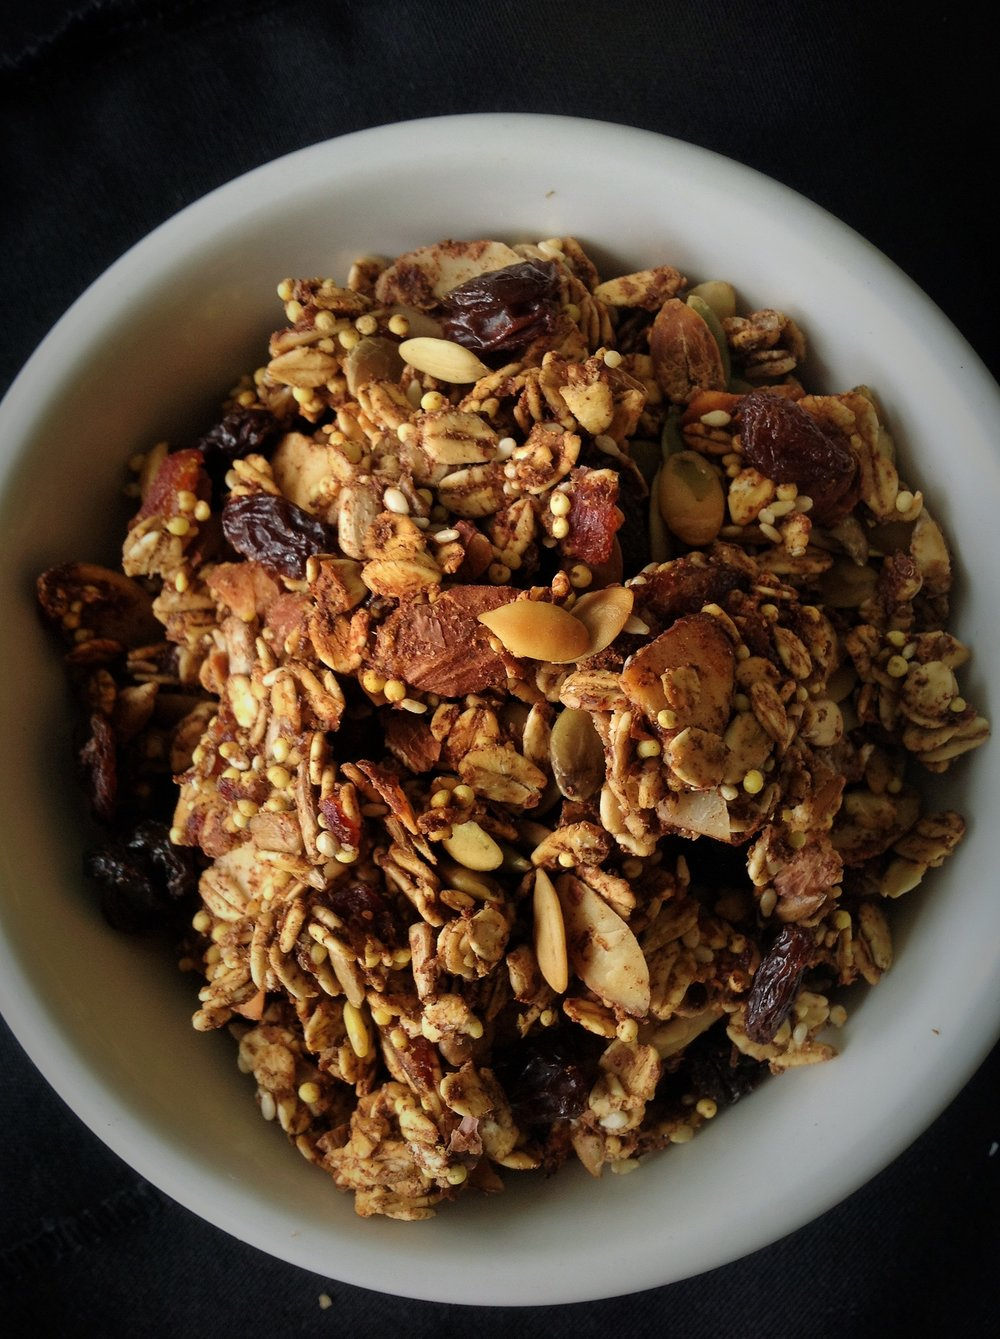 Pumpkin Seed Millet Gluten-Free Granola - Healthy, Plant-Based, Oil-Free, No Refined Sugar, Vegan Breakfast Snack Recipe